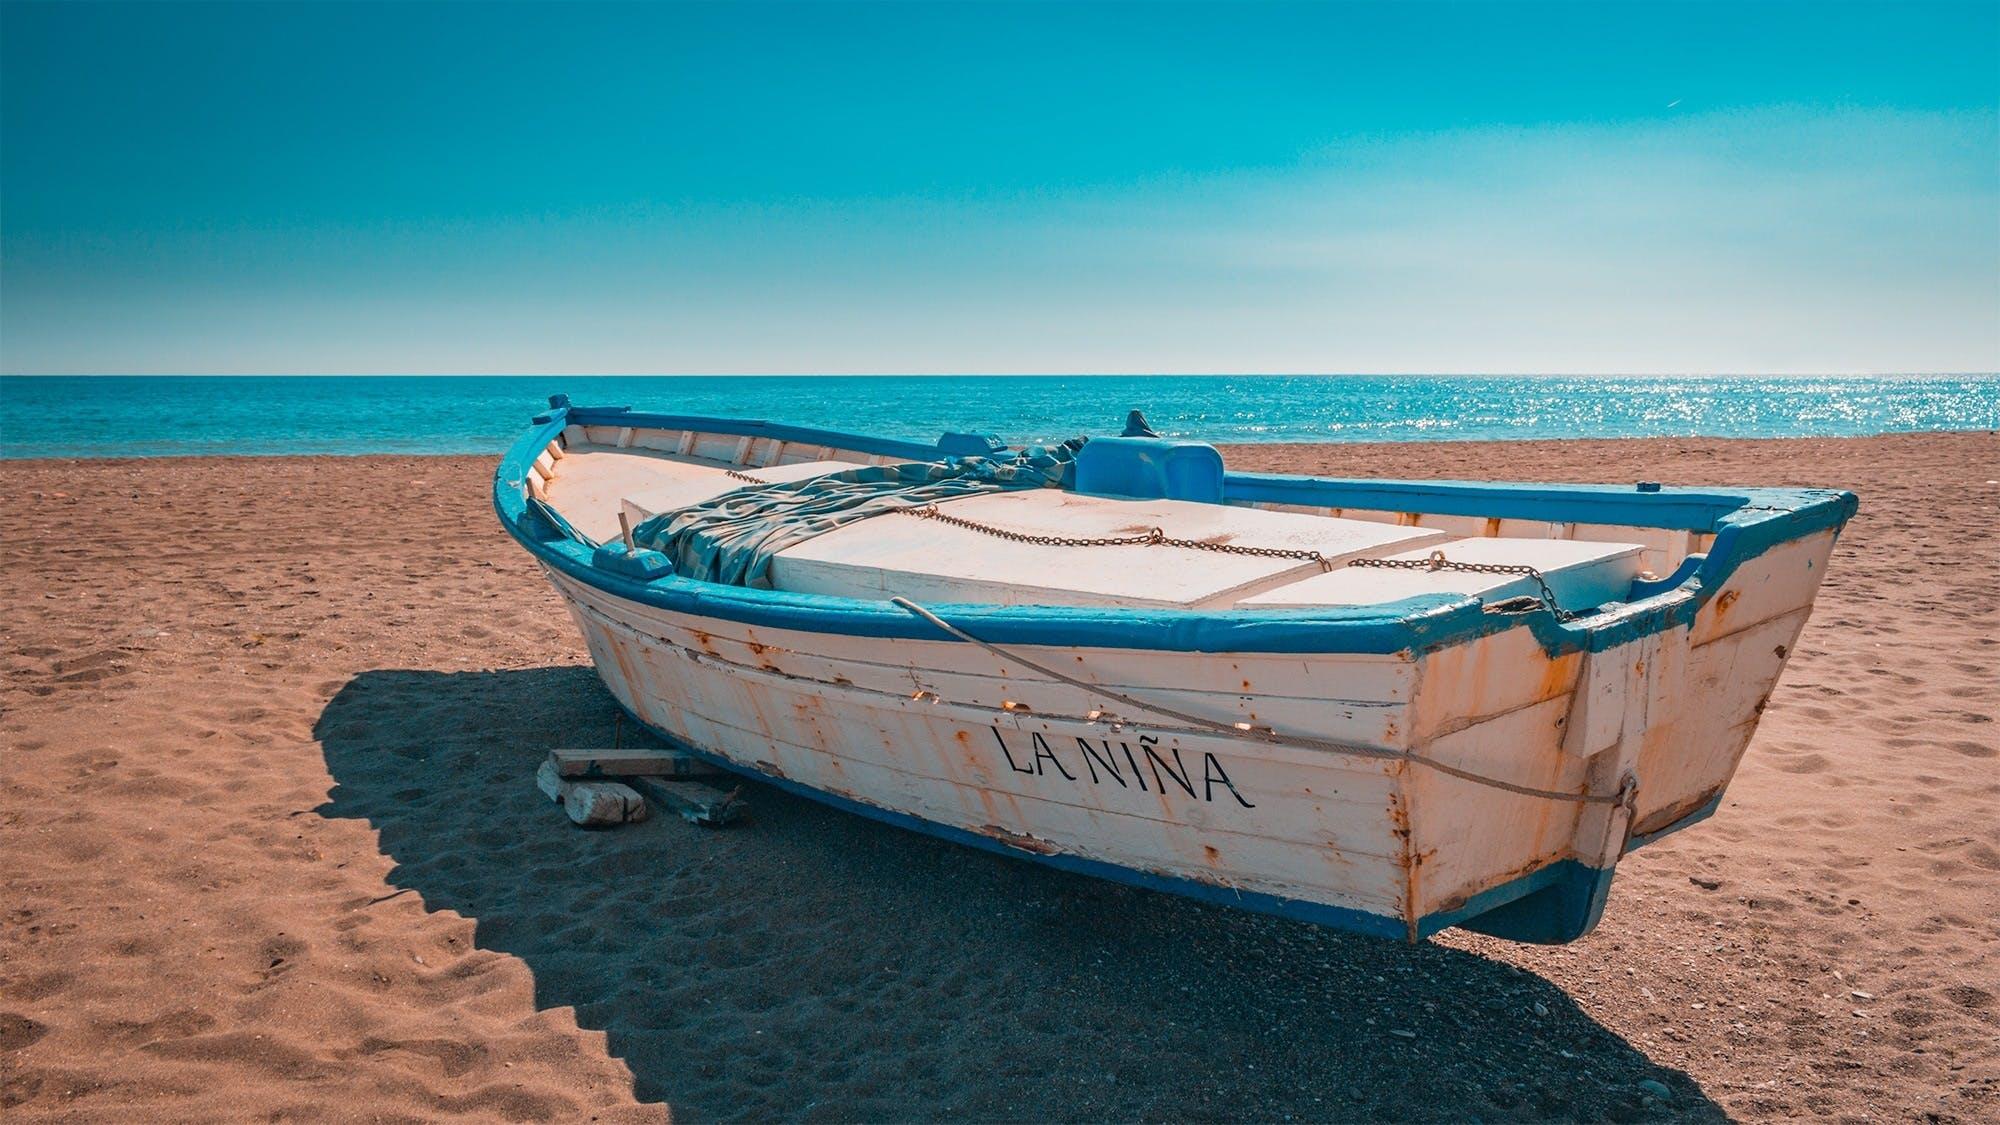 beach, blue sky, boat